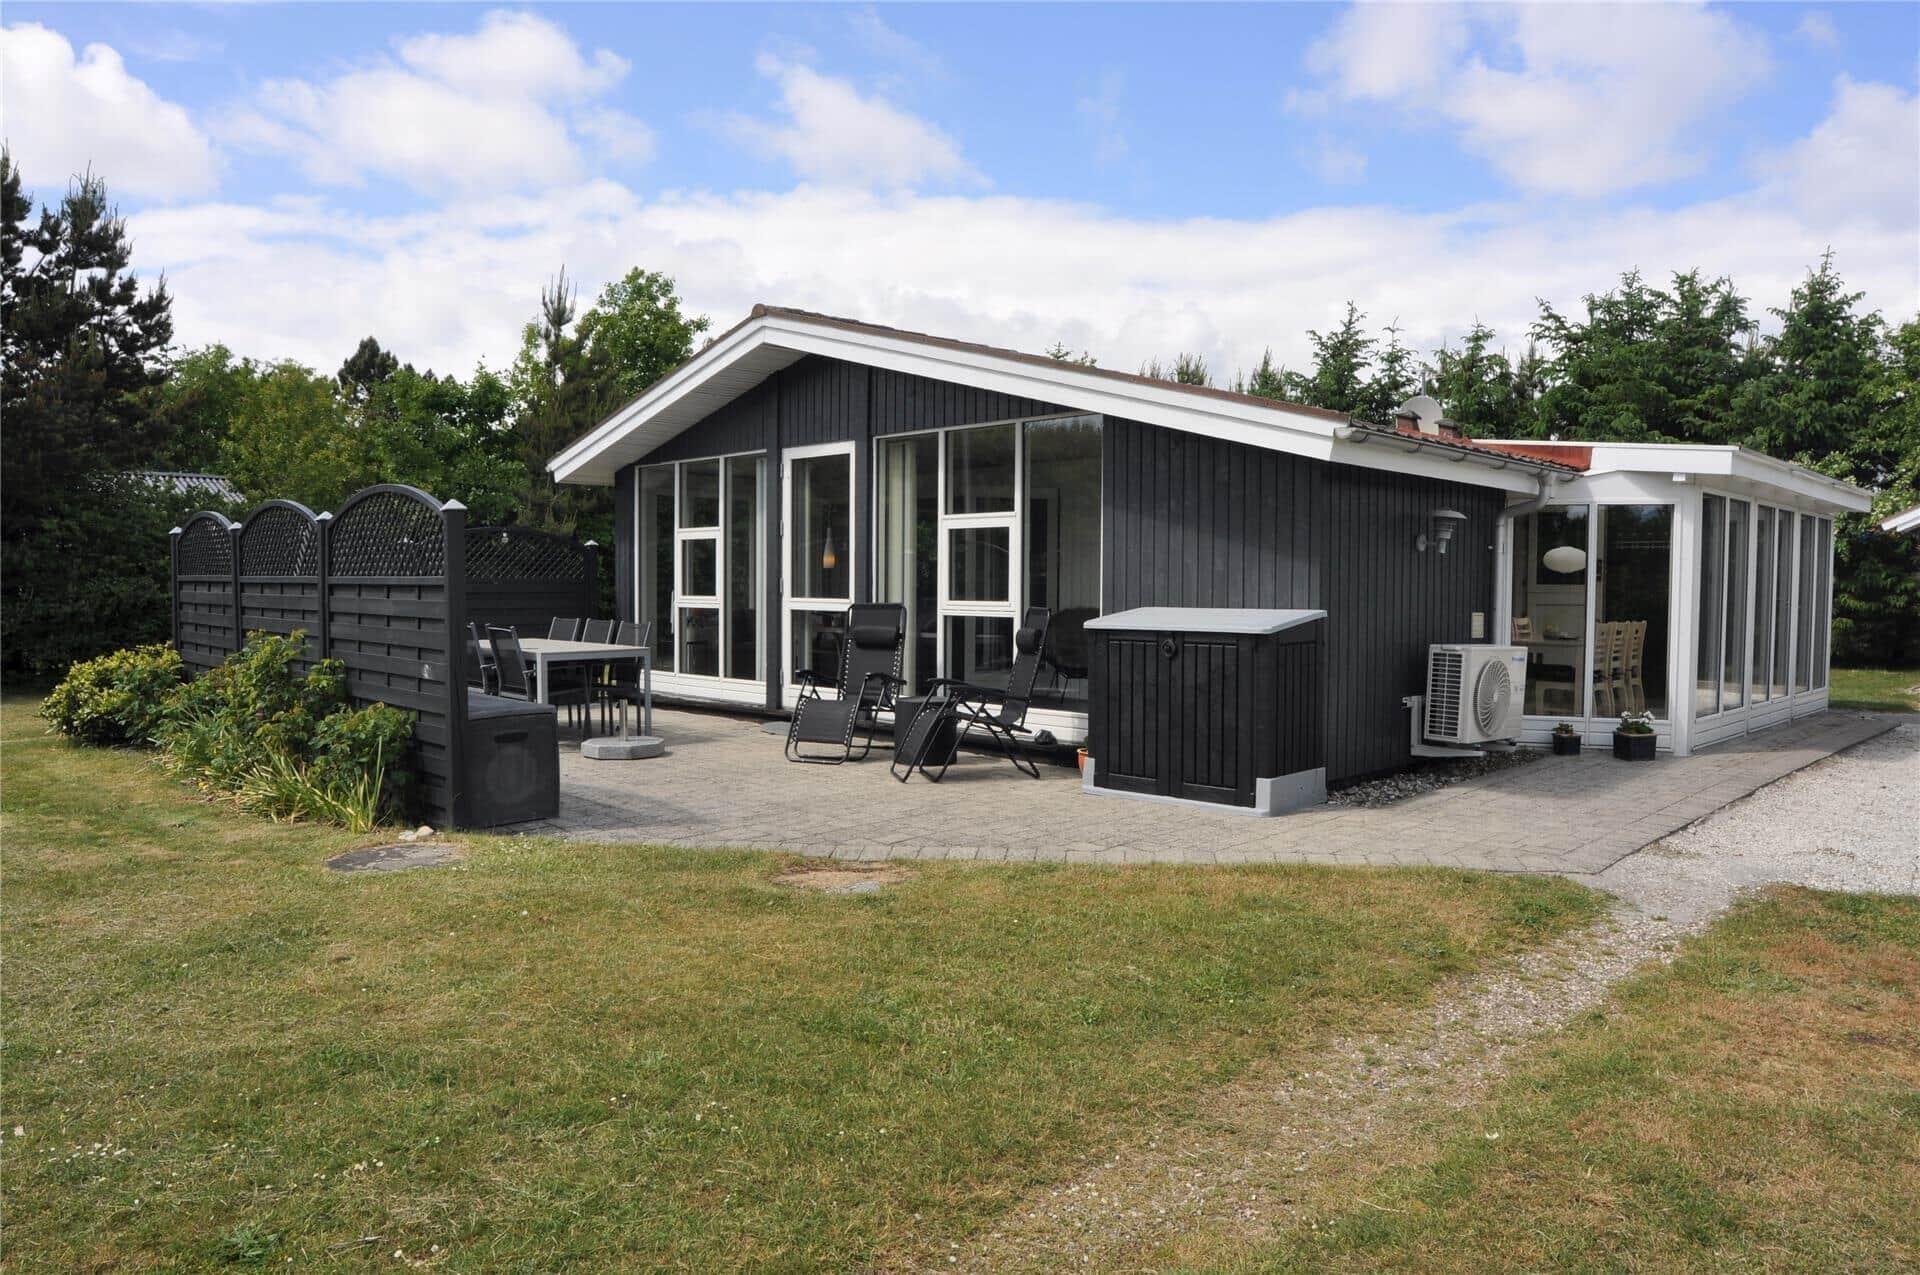 Bild 1-175 Ferienhaus 30171, Snerlevej 492, DK - 6990 Ulfborg